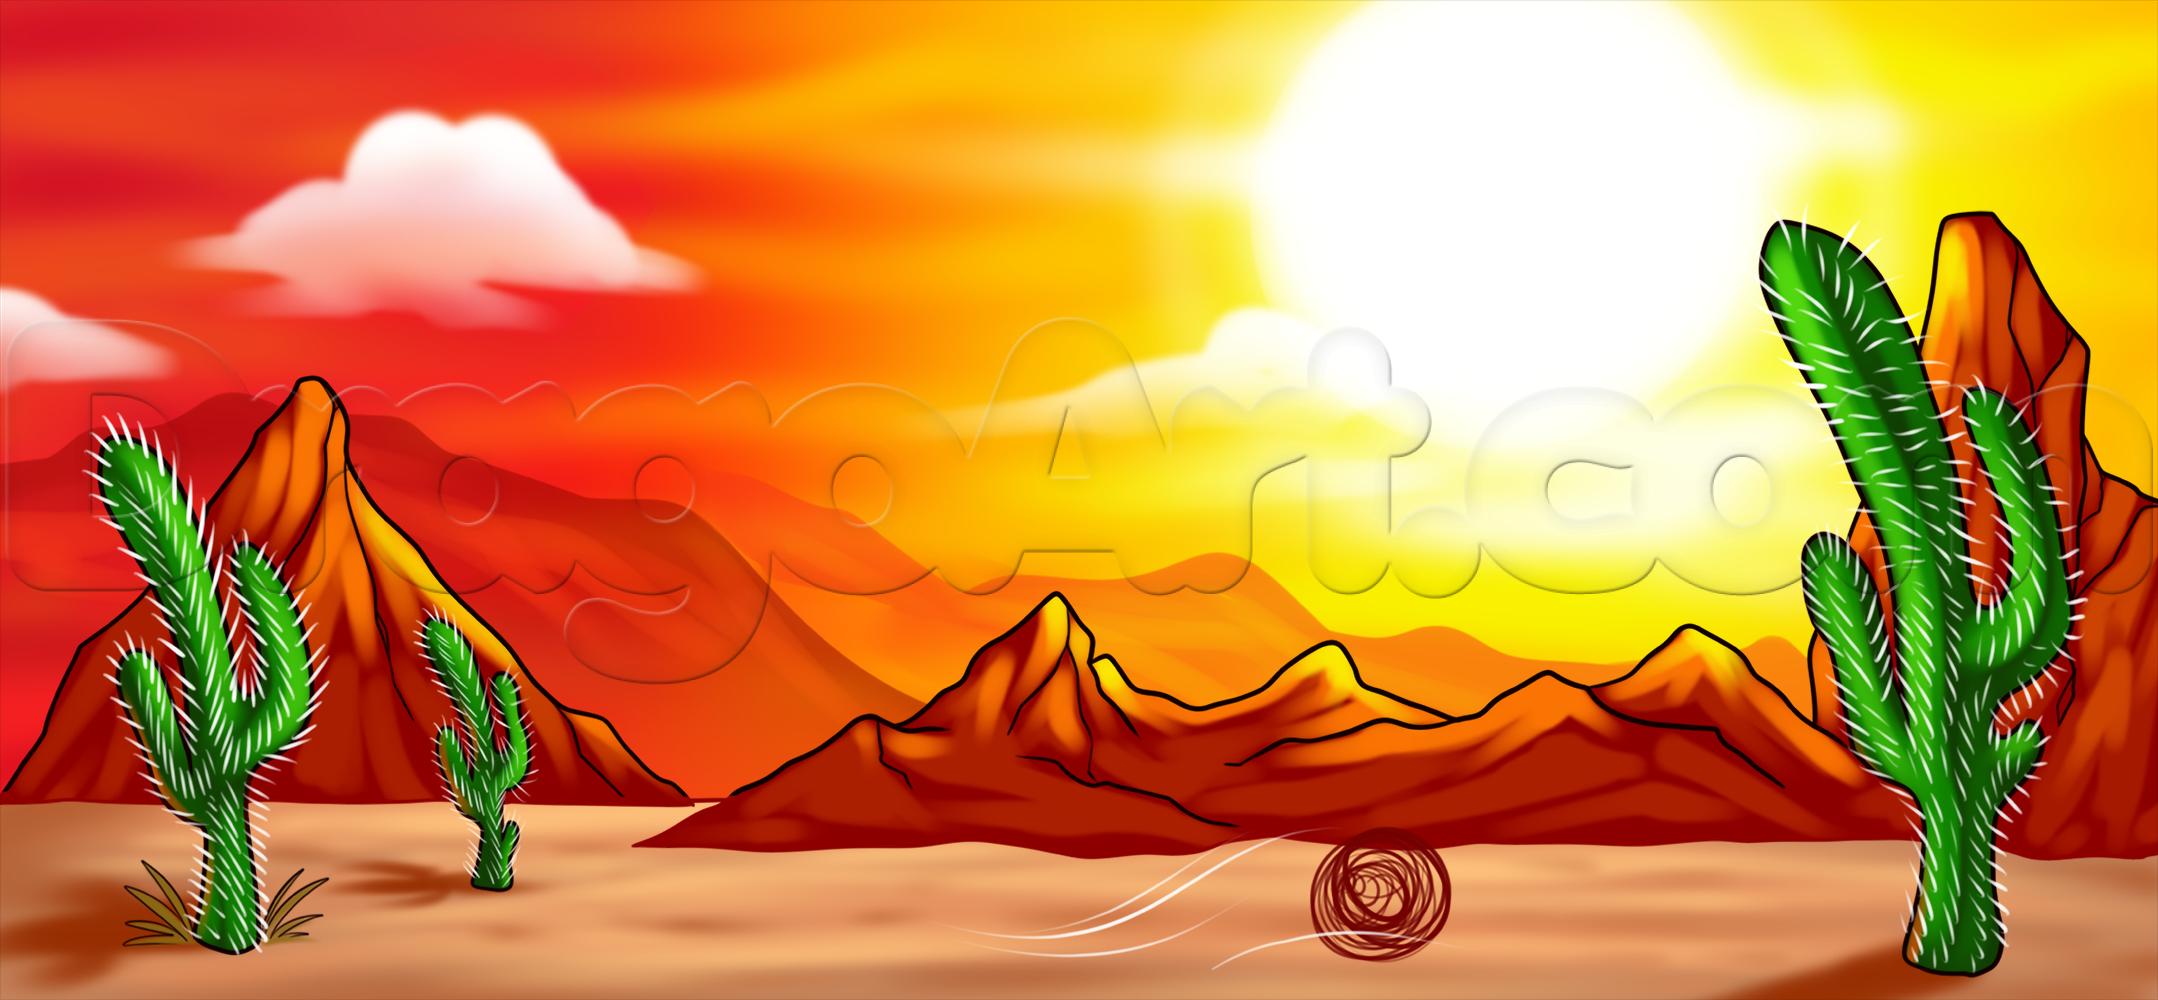 2158x1000 Desert Landscape Drawings Learn Mexican Desert Drawing, Landscapes